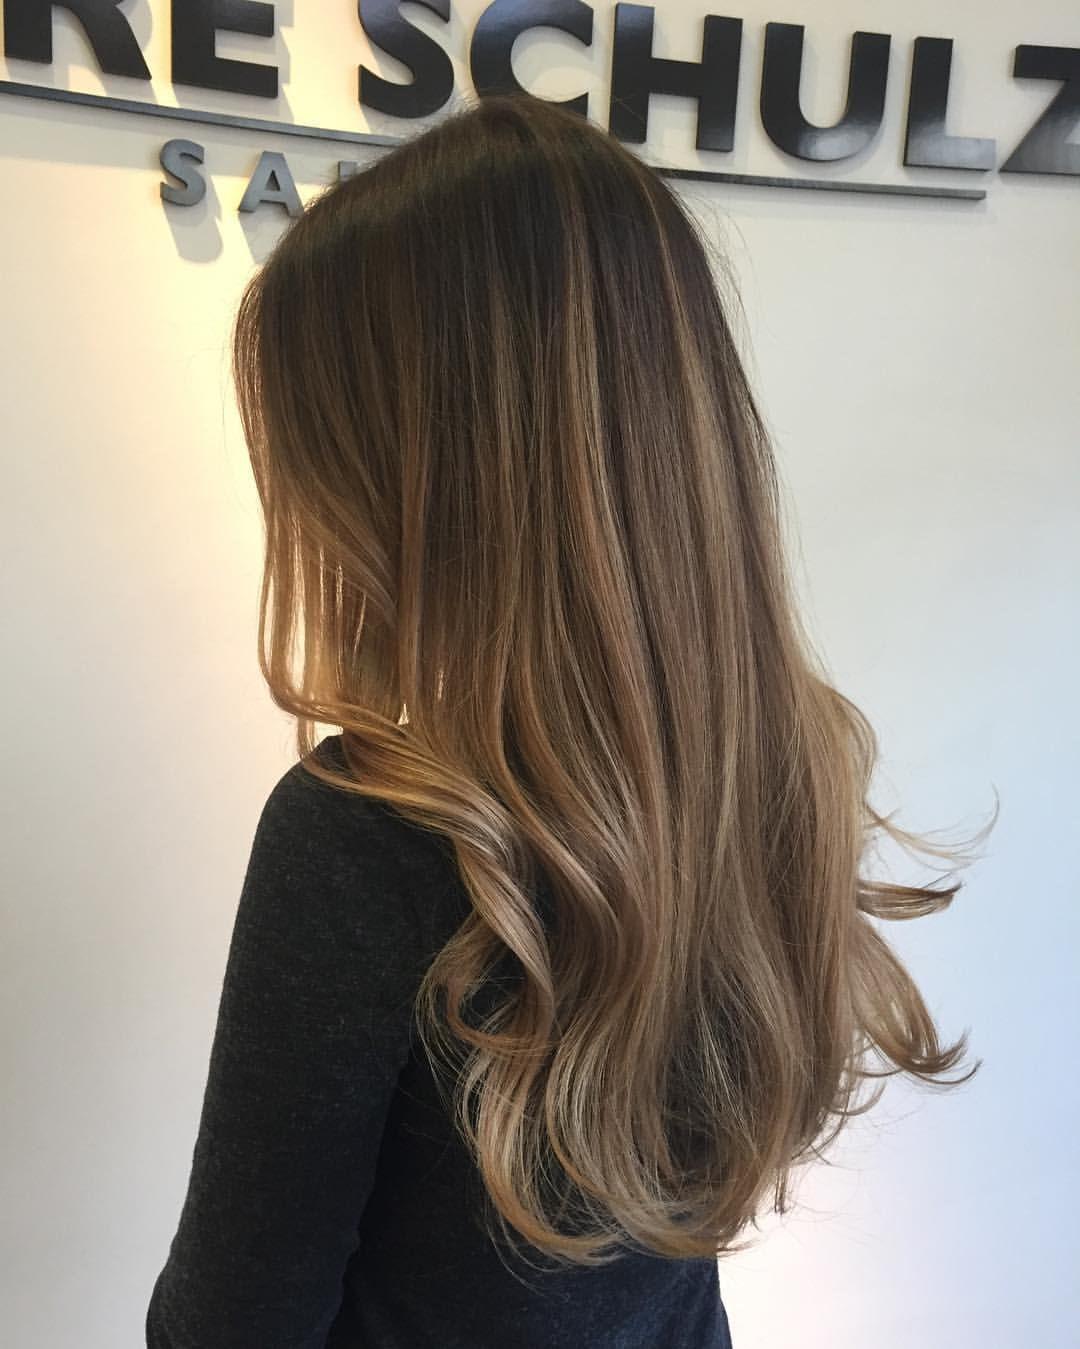 Pin Van Samantha Cunningham Op Balayage Hair Bruin Haar Met Highlights Bruin Haar Highlights Lichtbruin Haar